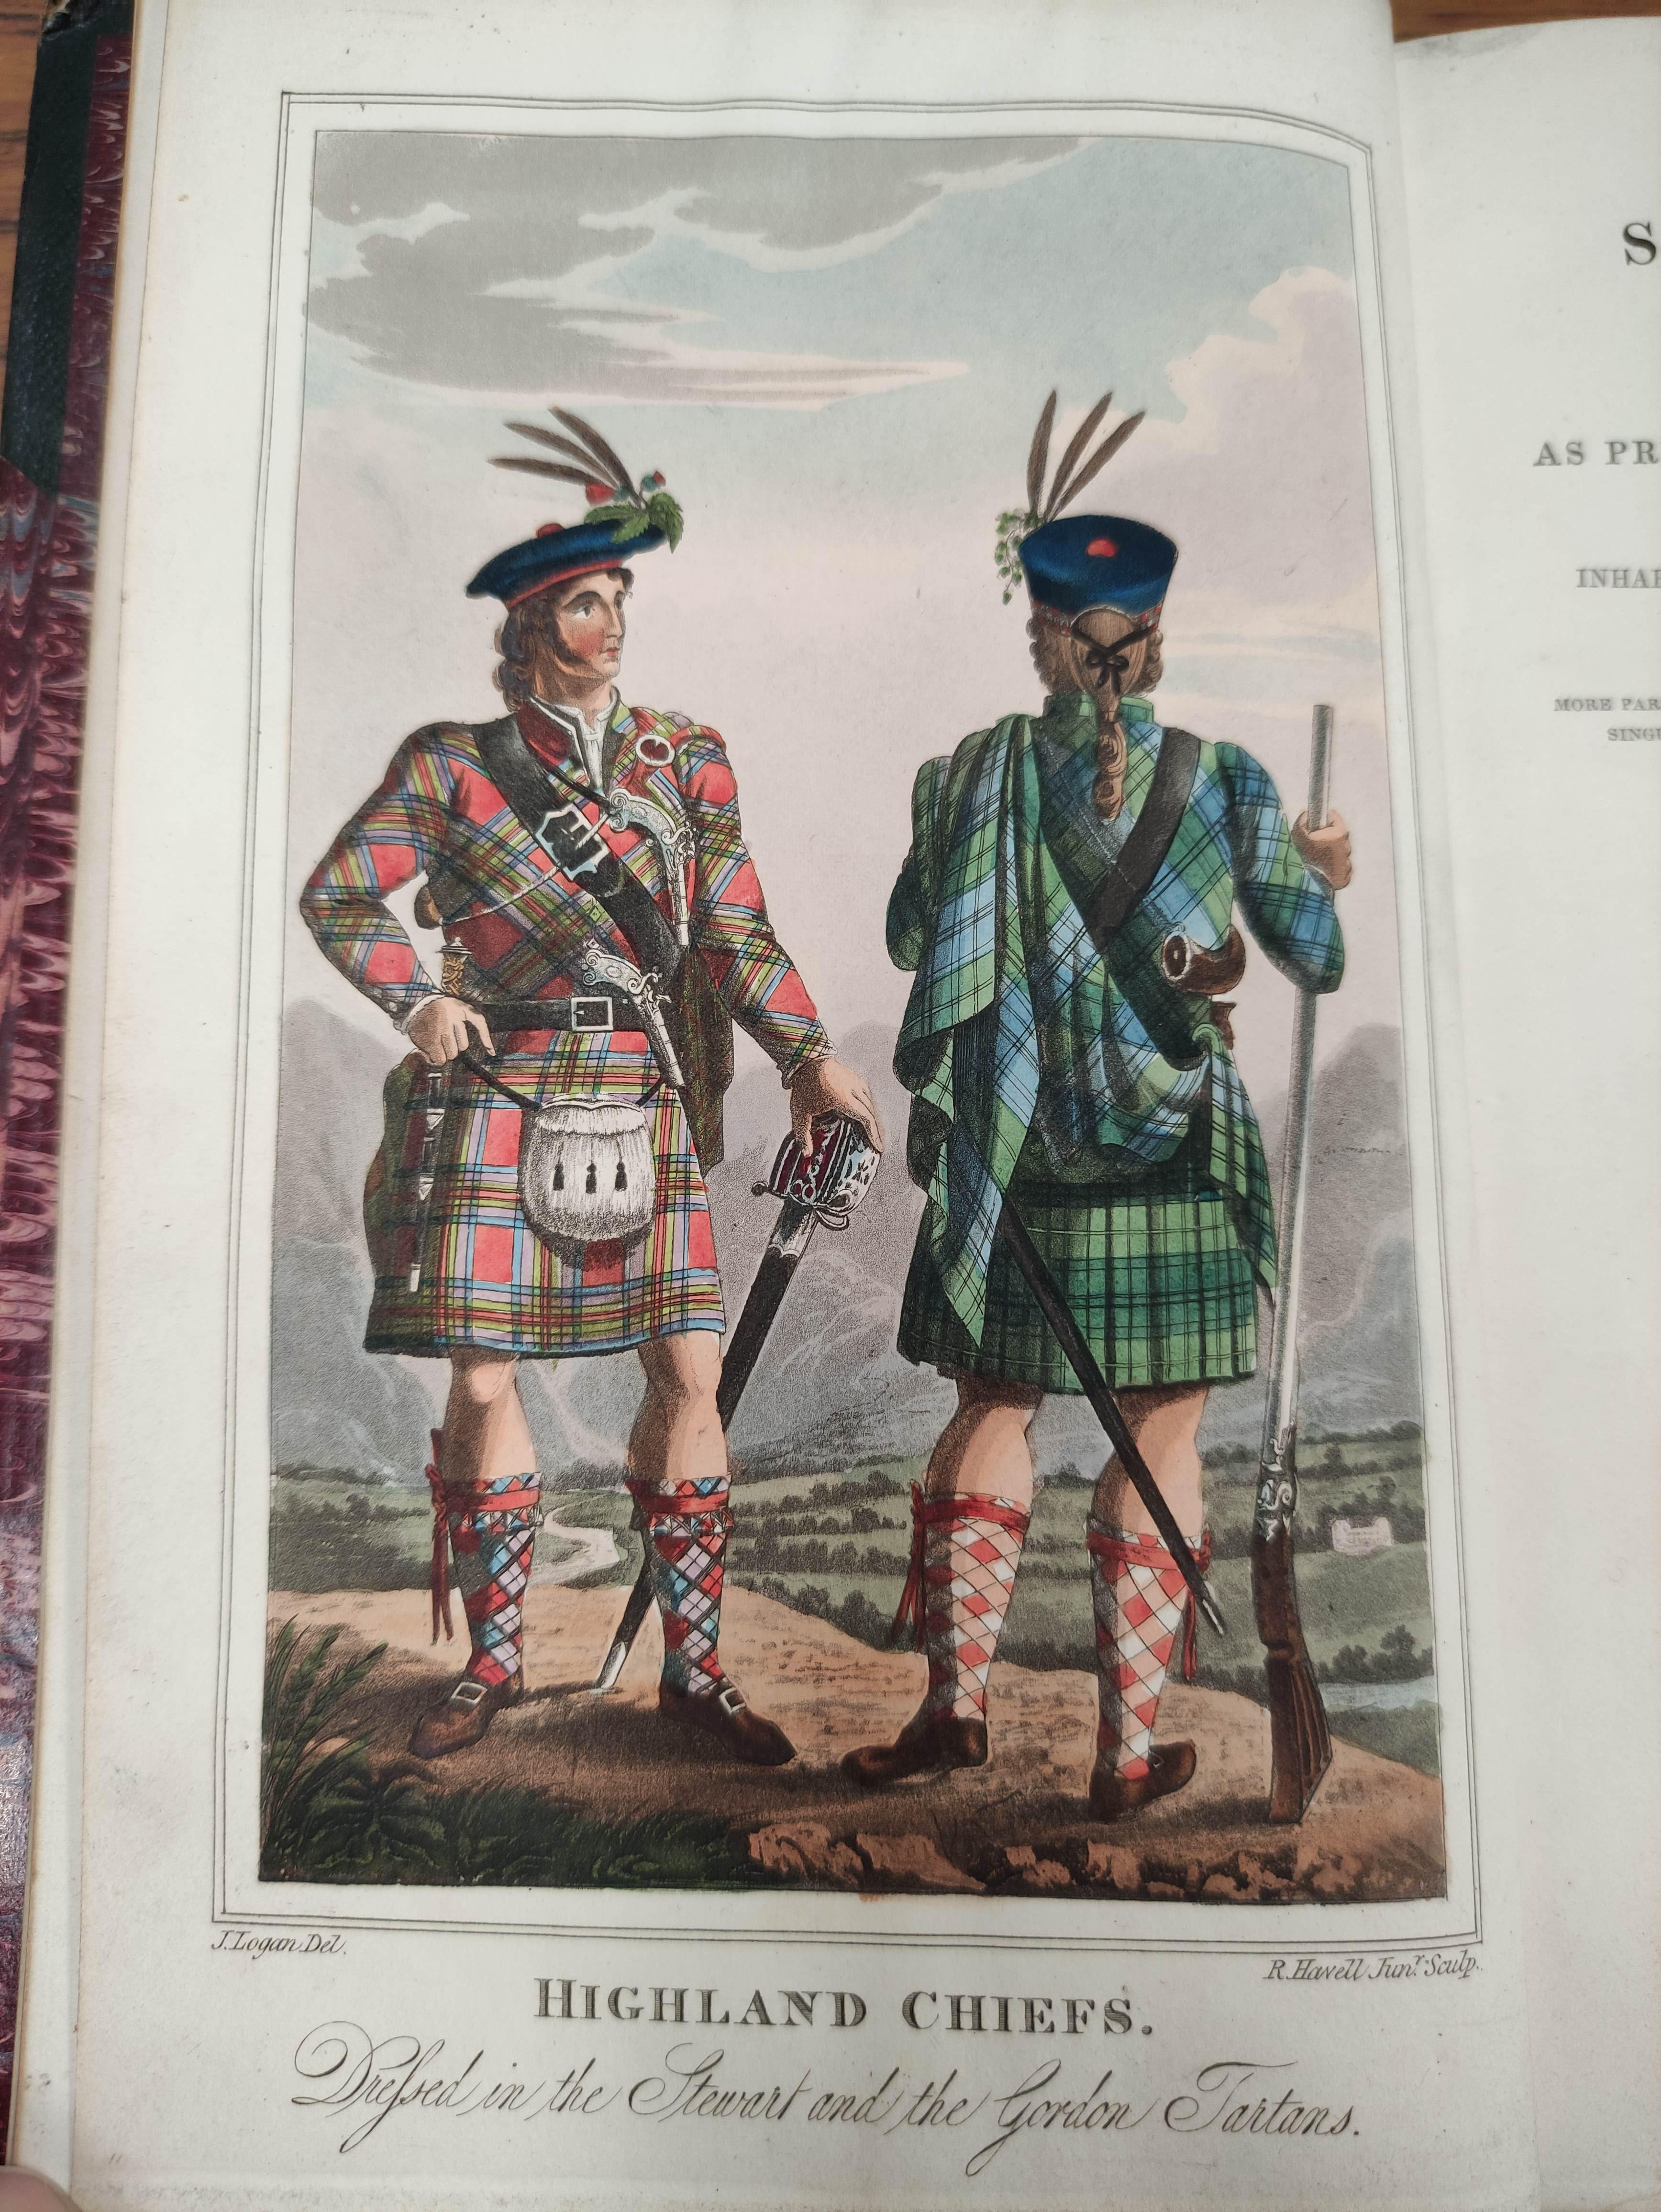 LOGAN JAMES.The Scottish Gael. 2 vols. Col. frontis & text illus. Half green morocco. A nice - Image 5 of 10